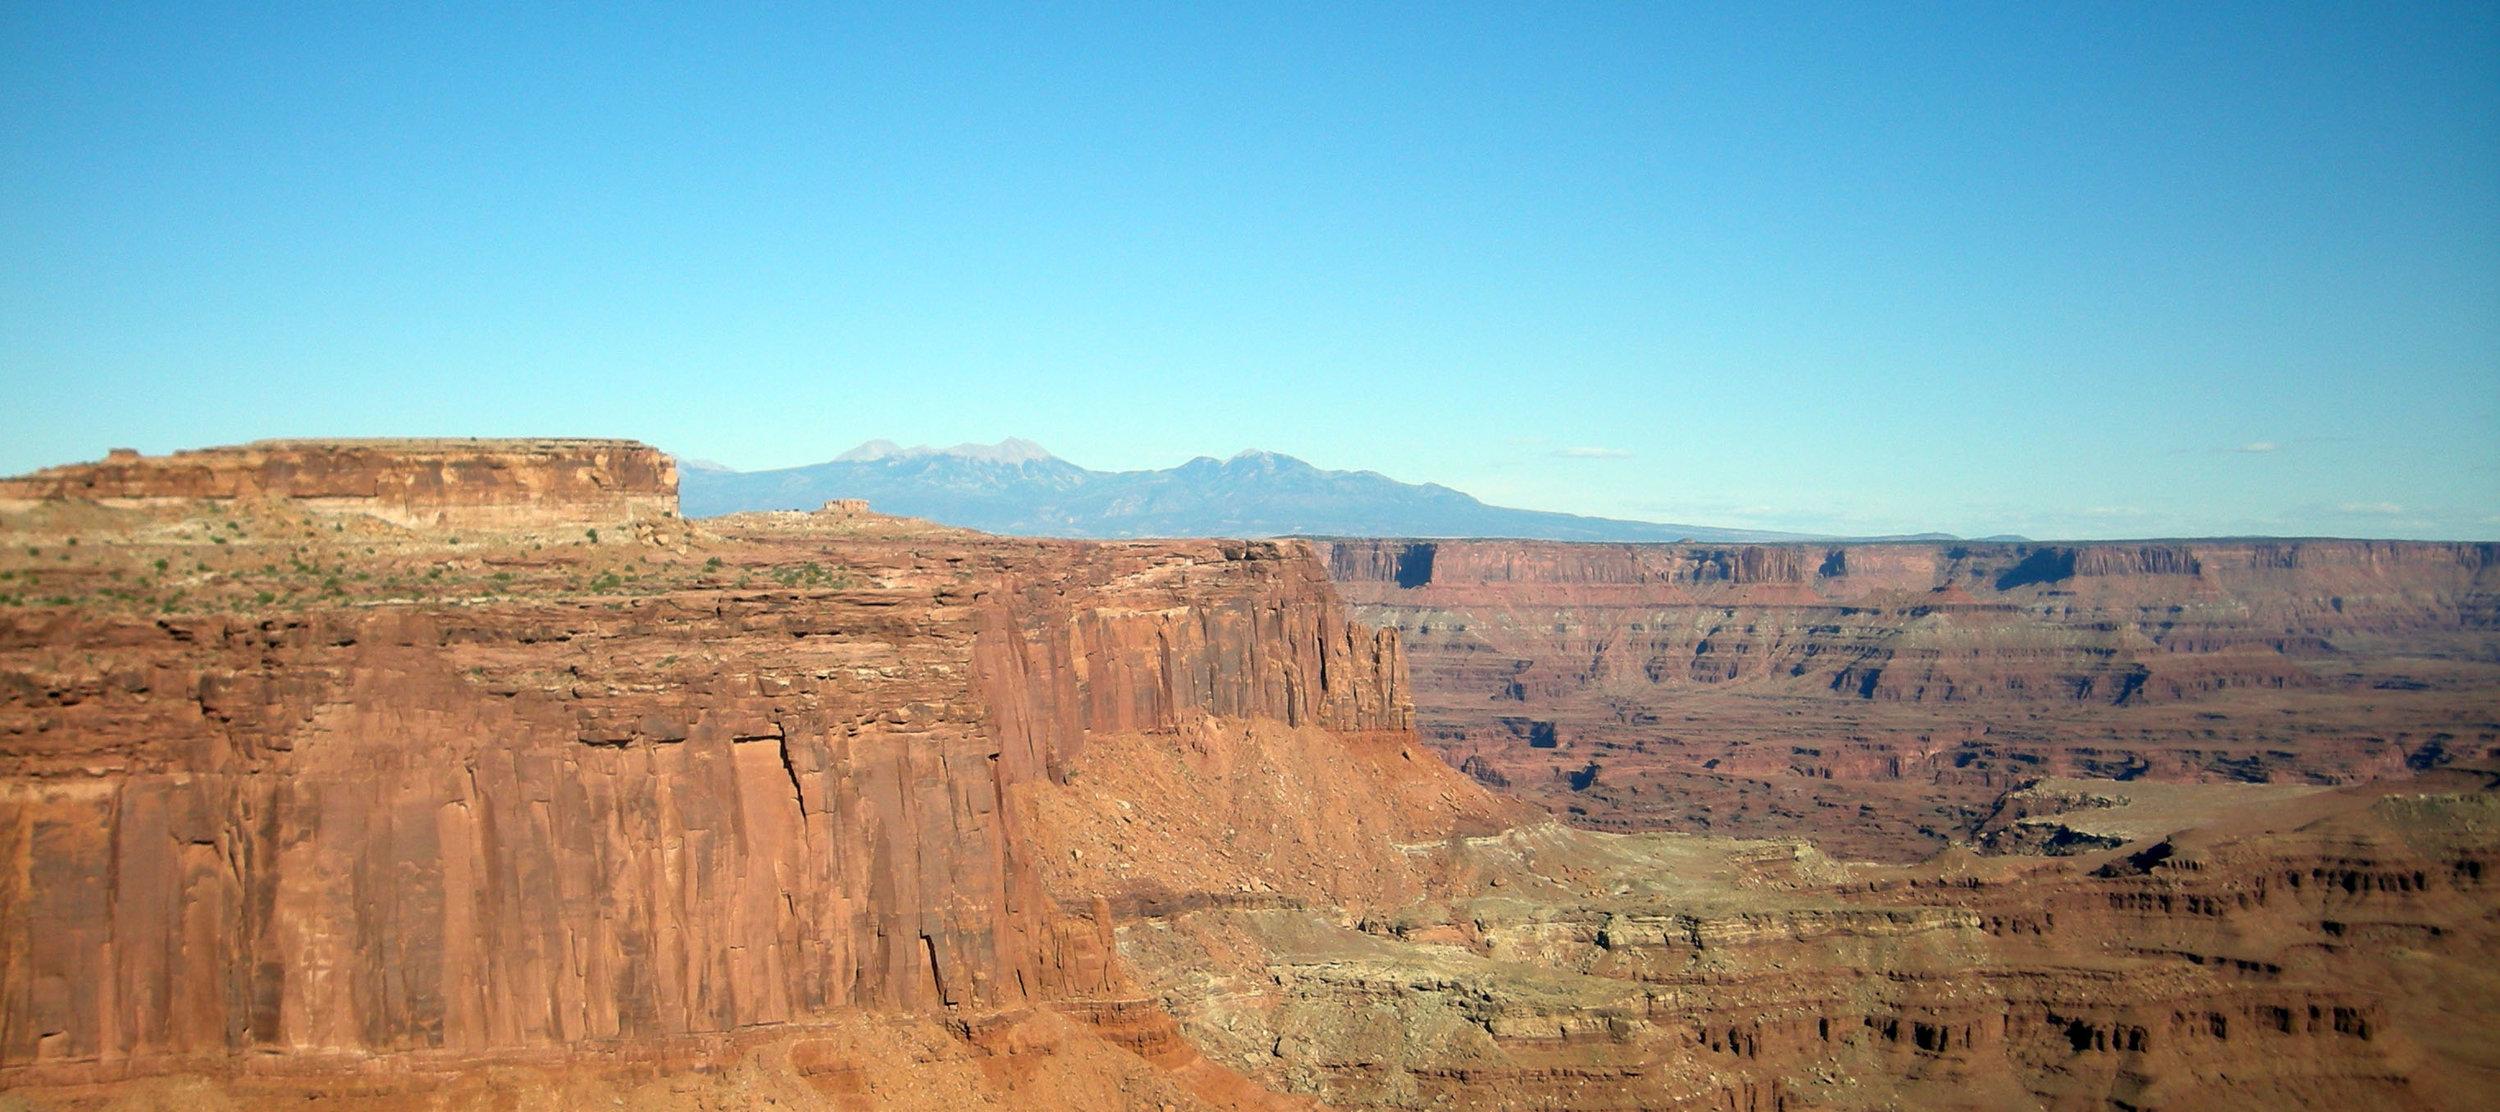 Lathrop trail Canyonlands NP.jpg